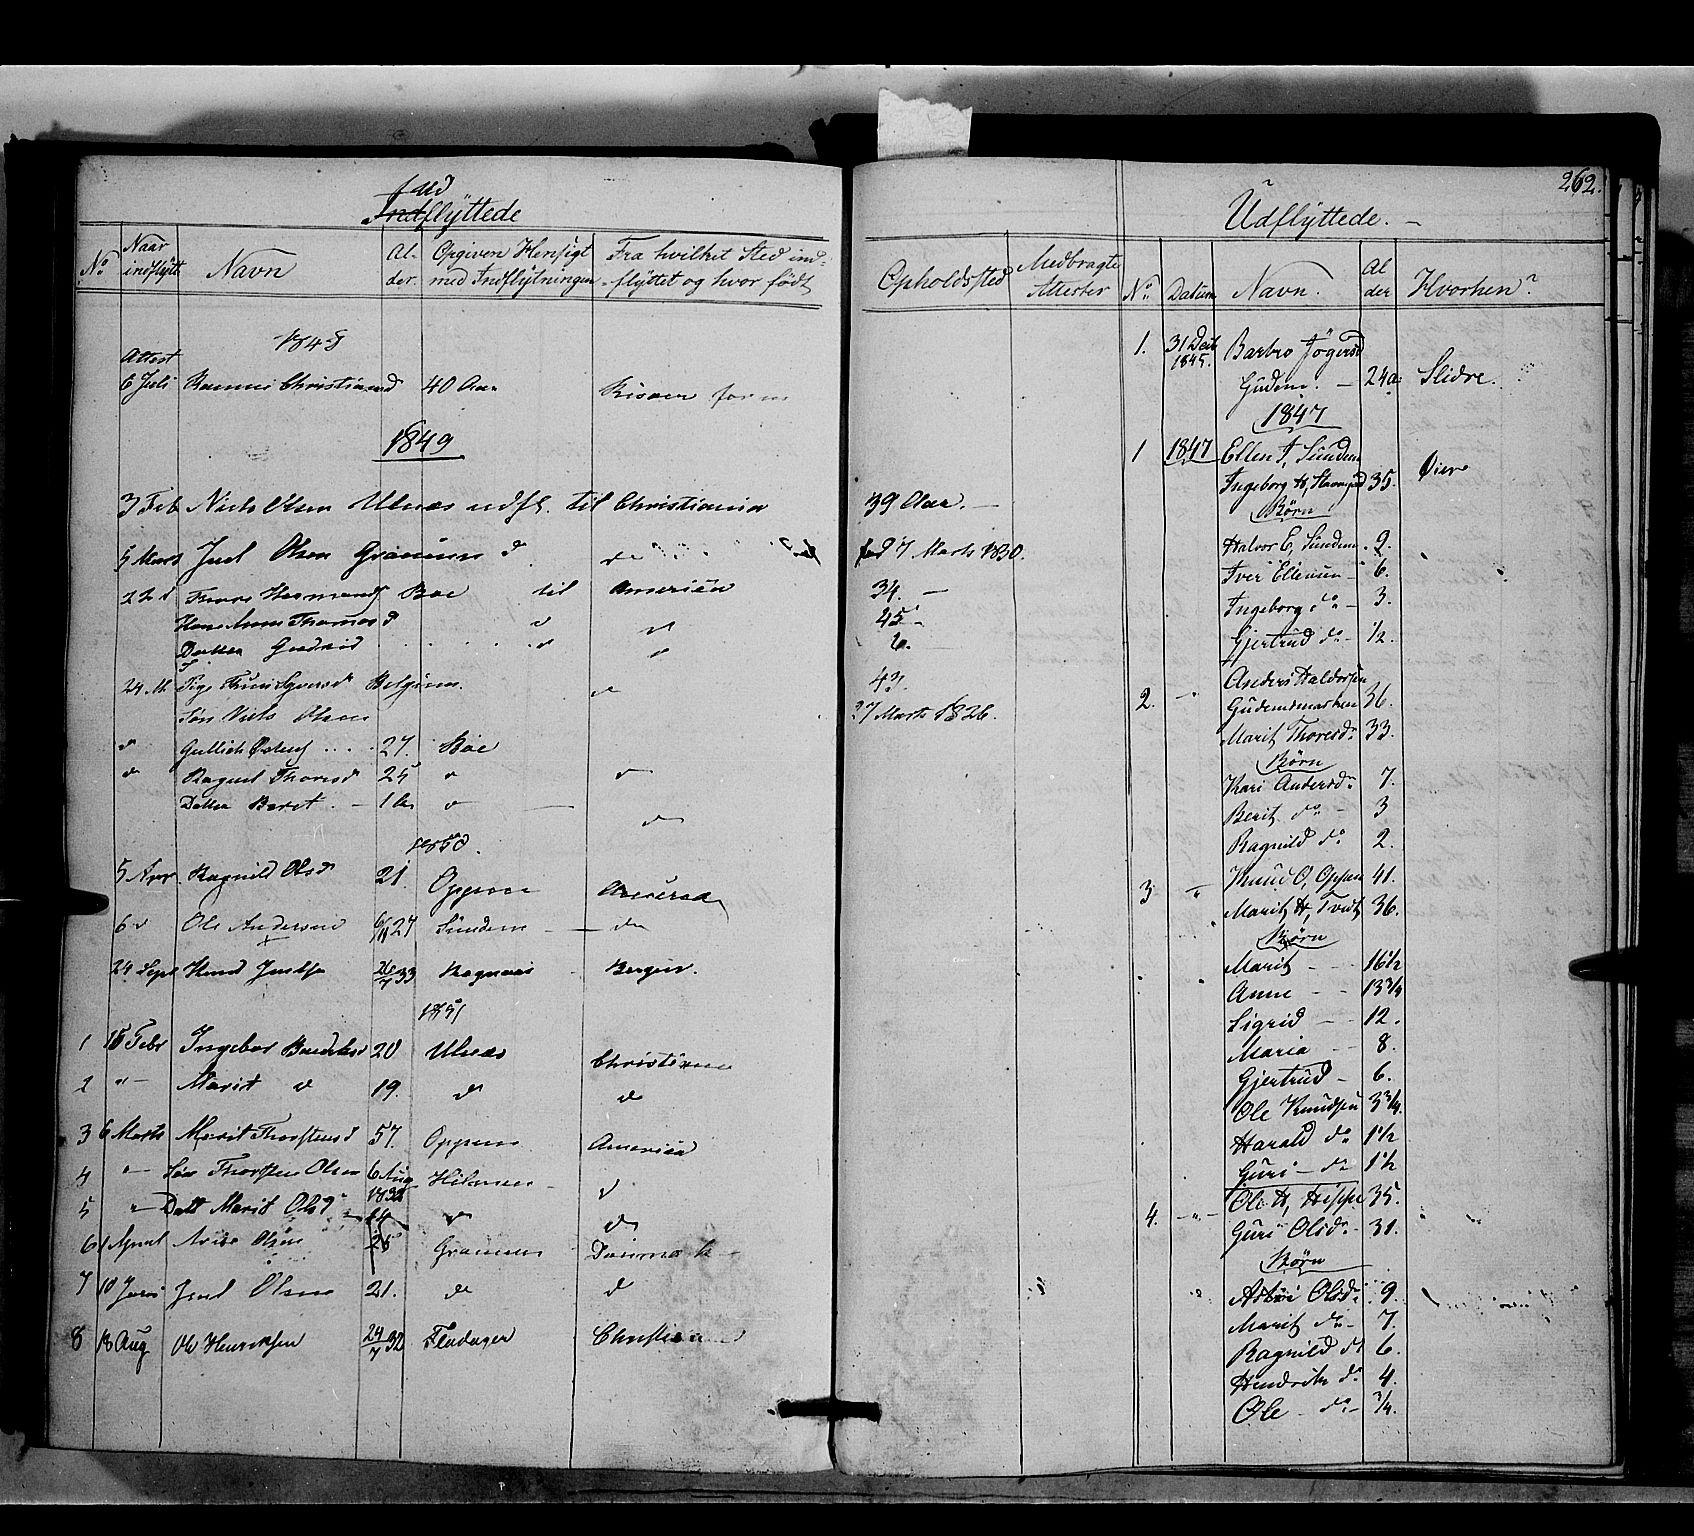 SAH, Nord-Aurdal prestekontor, Ministerialbok nr. 6, 1842-1863, s. 262